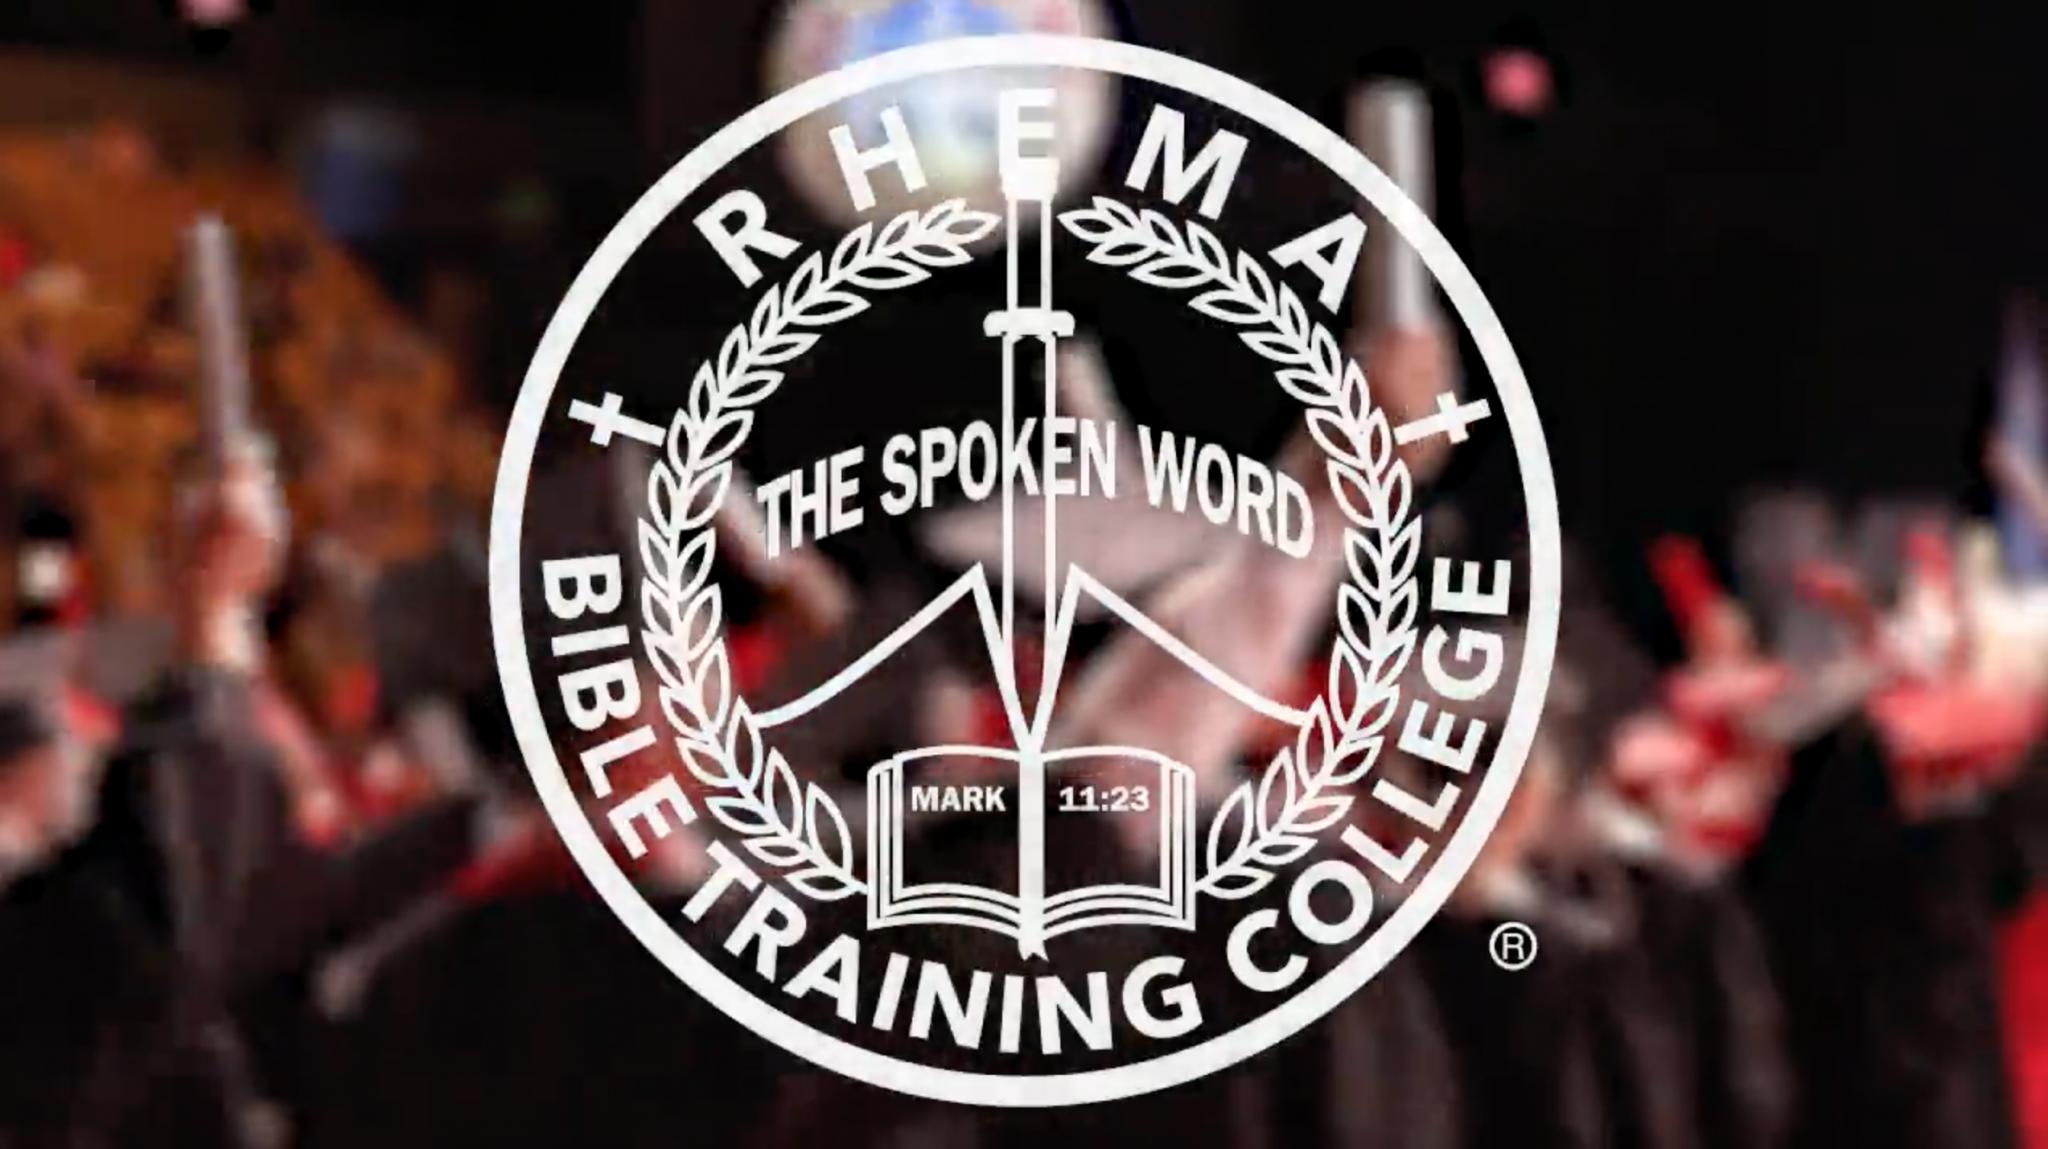 Accredited Bible College - Rhema Bible Training College